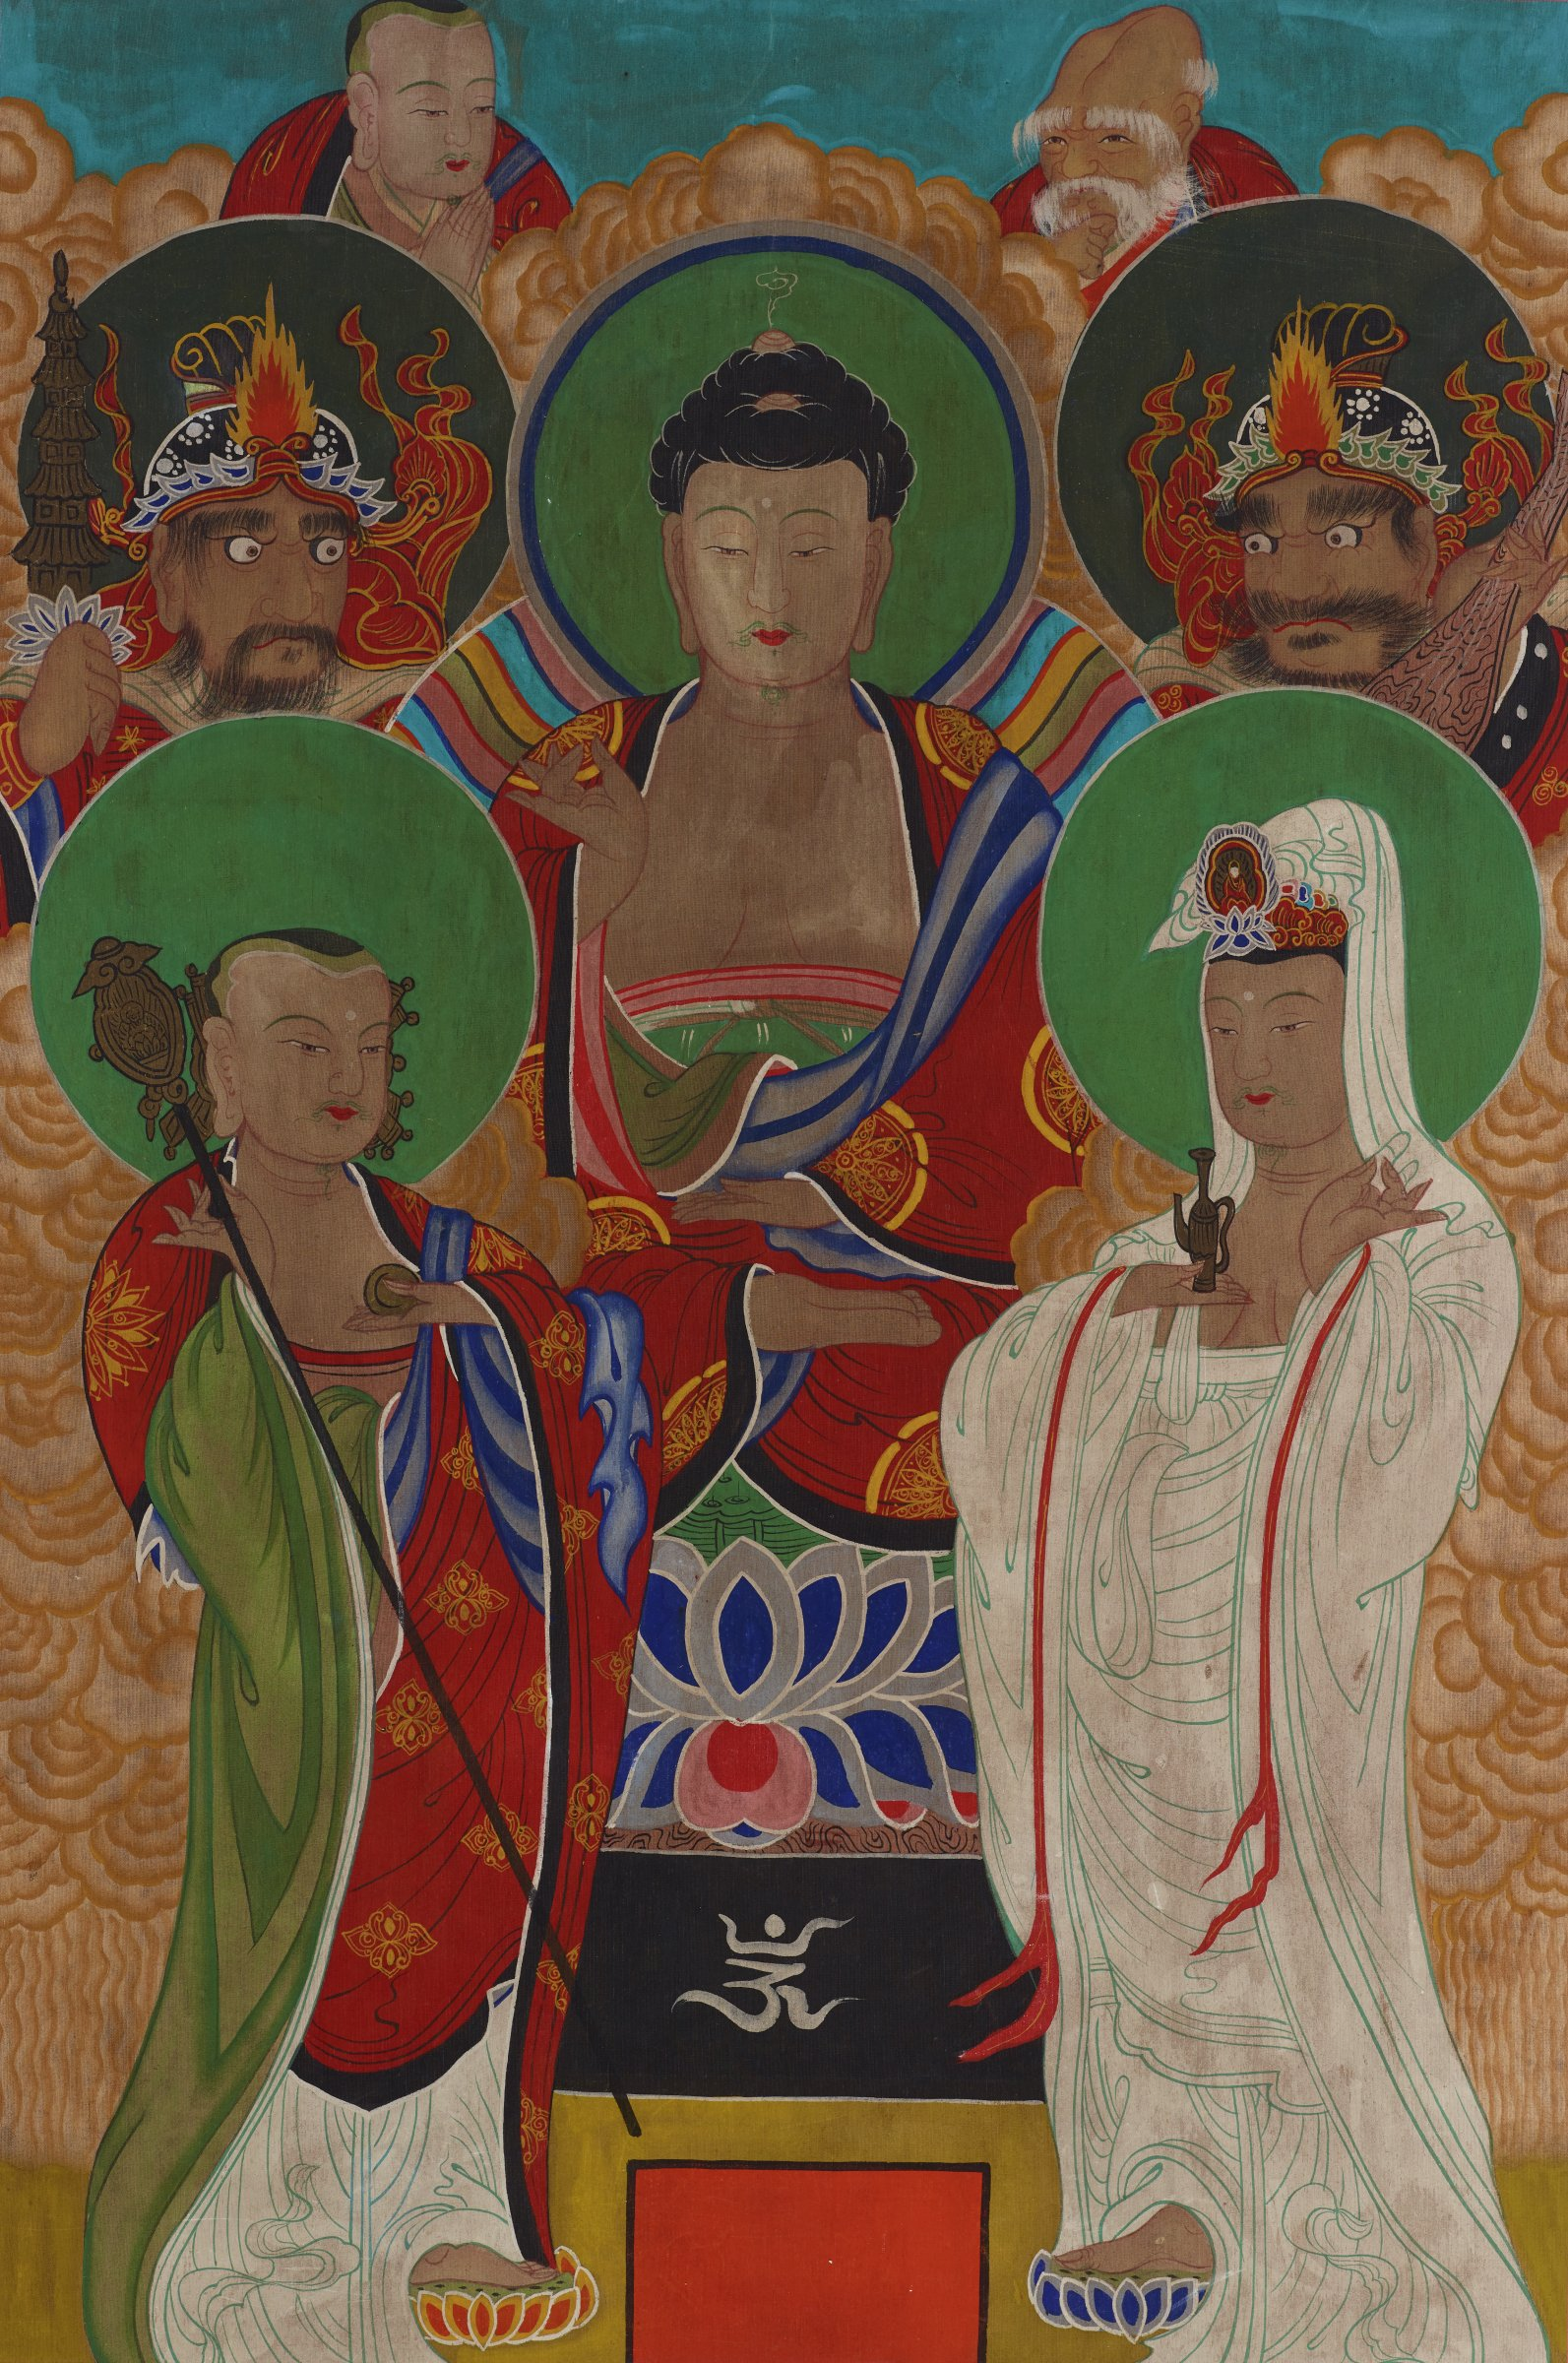 Amitabha Buddha Flanked by Kshitigarbha (Jijiang Bosal) and Avalokiteshvara (Gwanum Bosal), Dongja, Old Man of Longevity and Two Protectors